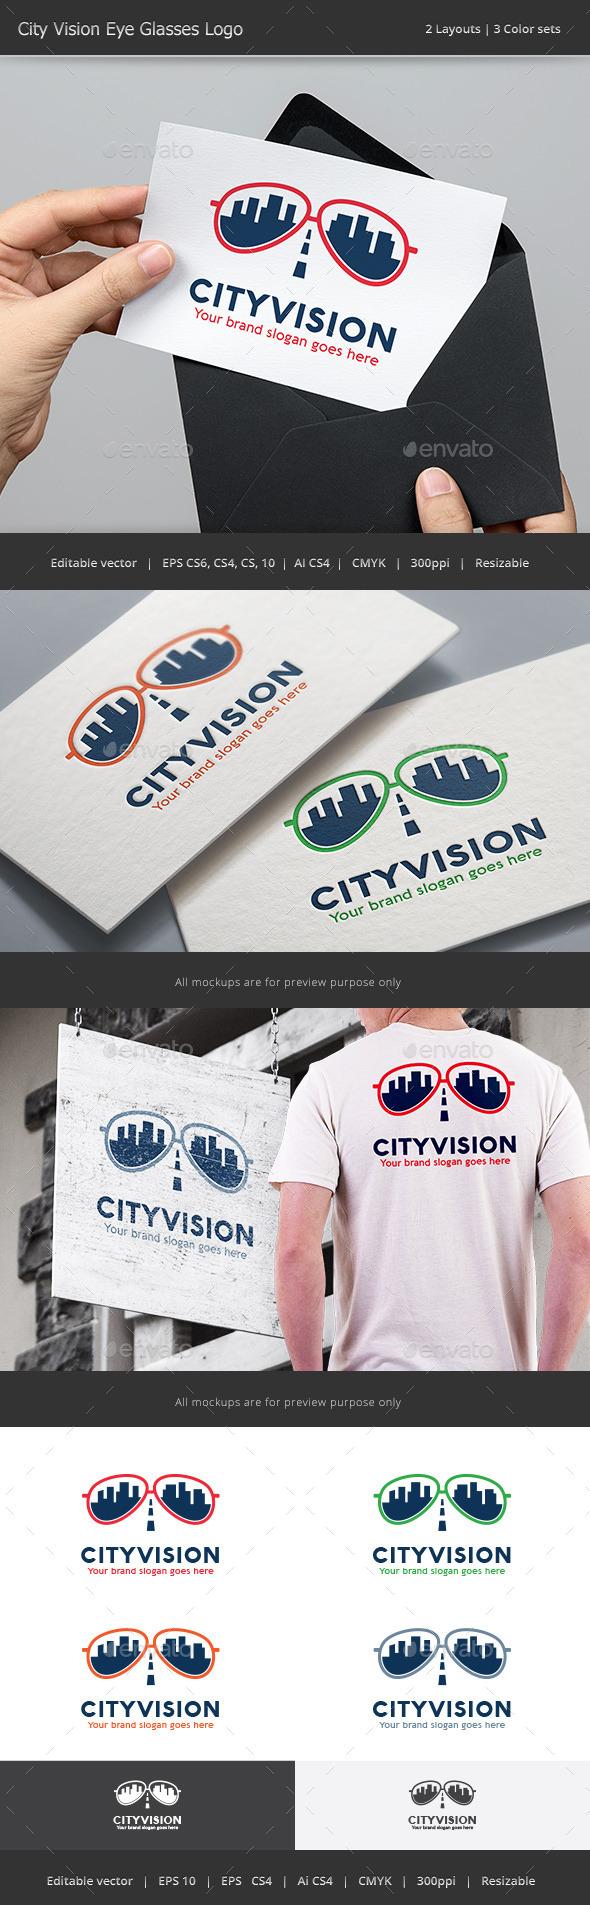 City Vision Eye Glasses Logo - Objects Logo Templates